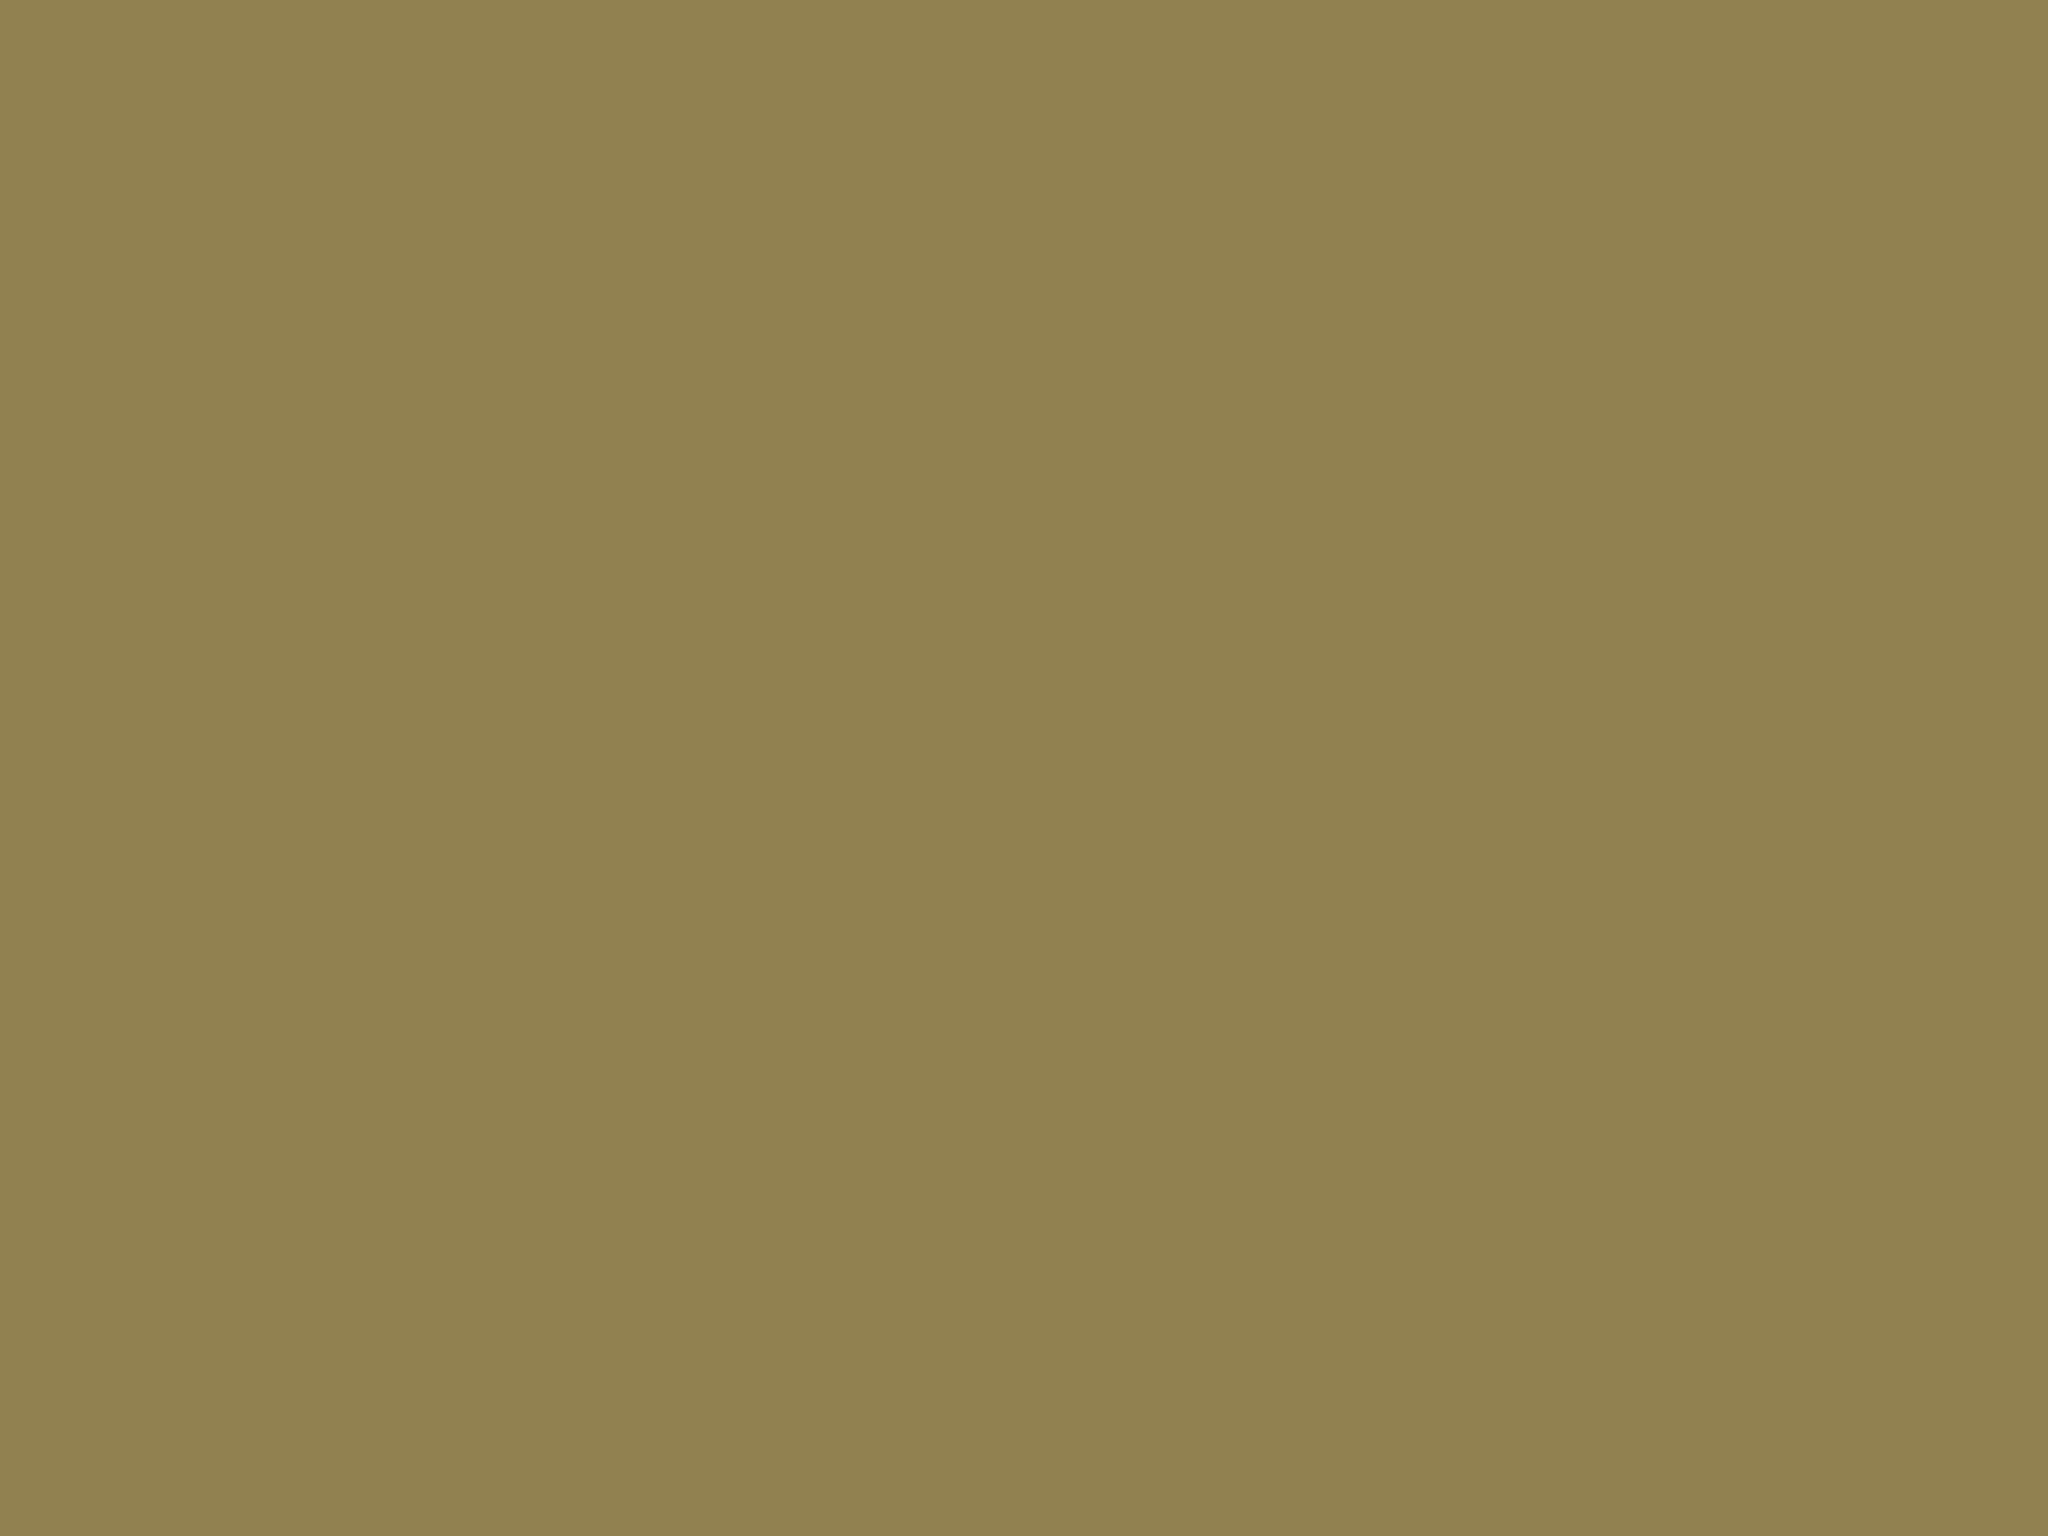 2048x1536 Dark Tan Solid Color Background